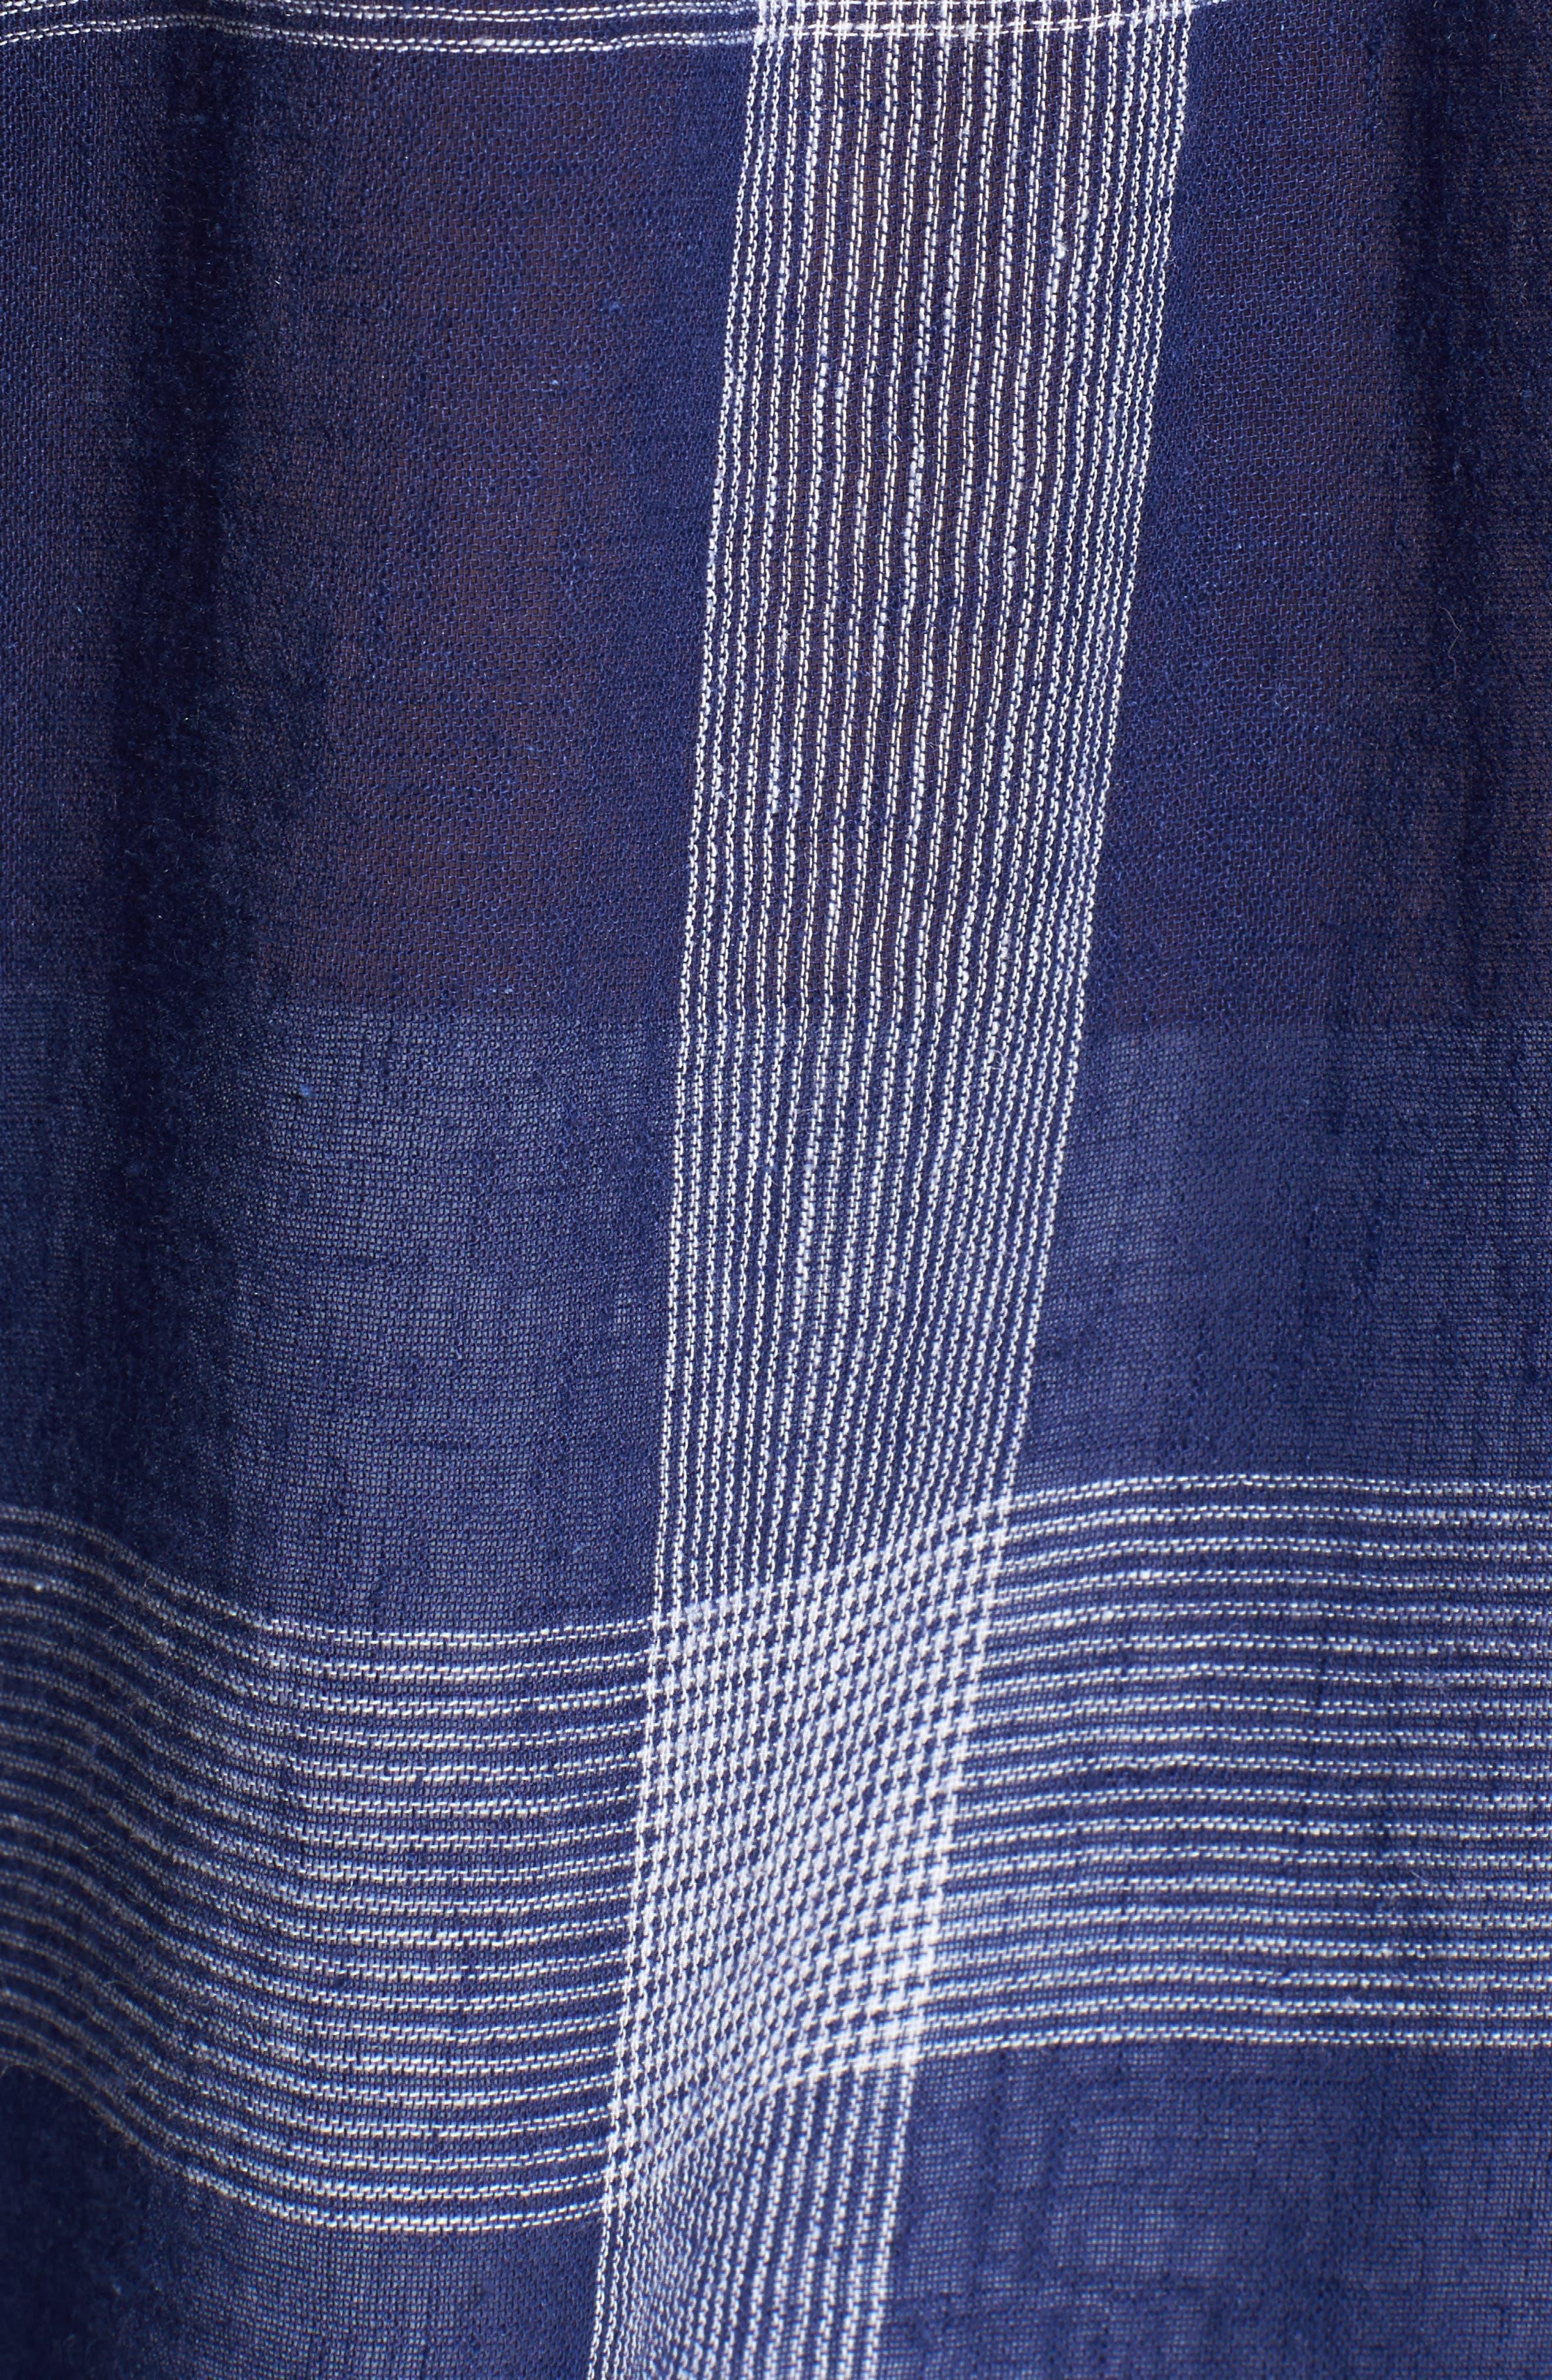 Charli Plaid Shirt,                             Alternate thumbnail 5, color,                             Patriot/ White